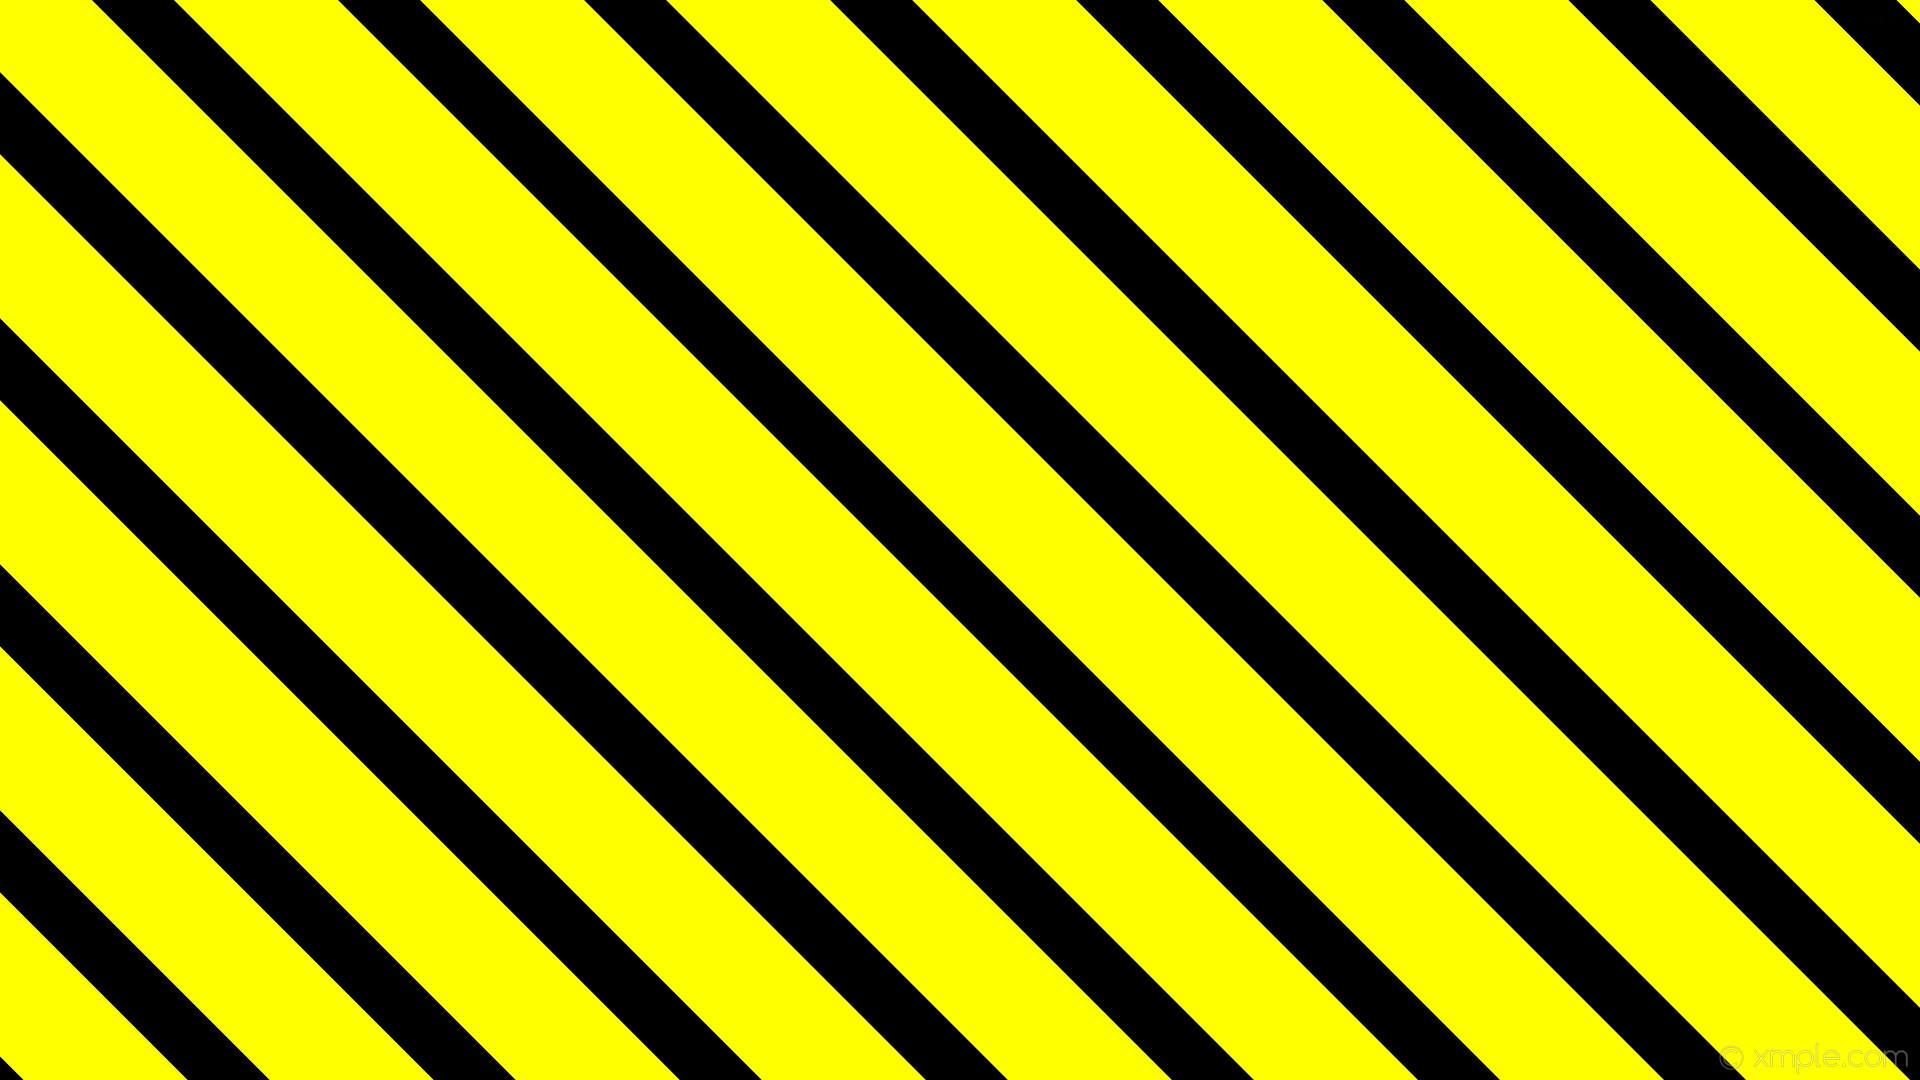 wallpaper yellow black stripes lines streaks #000000 #ffff00 diagonal 315°  58px 116px